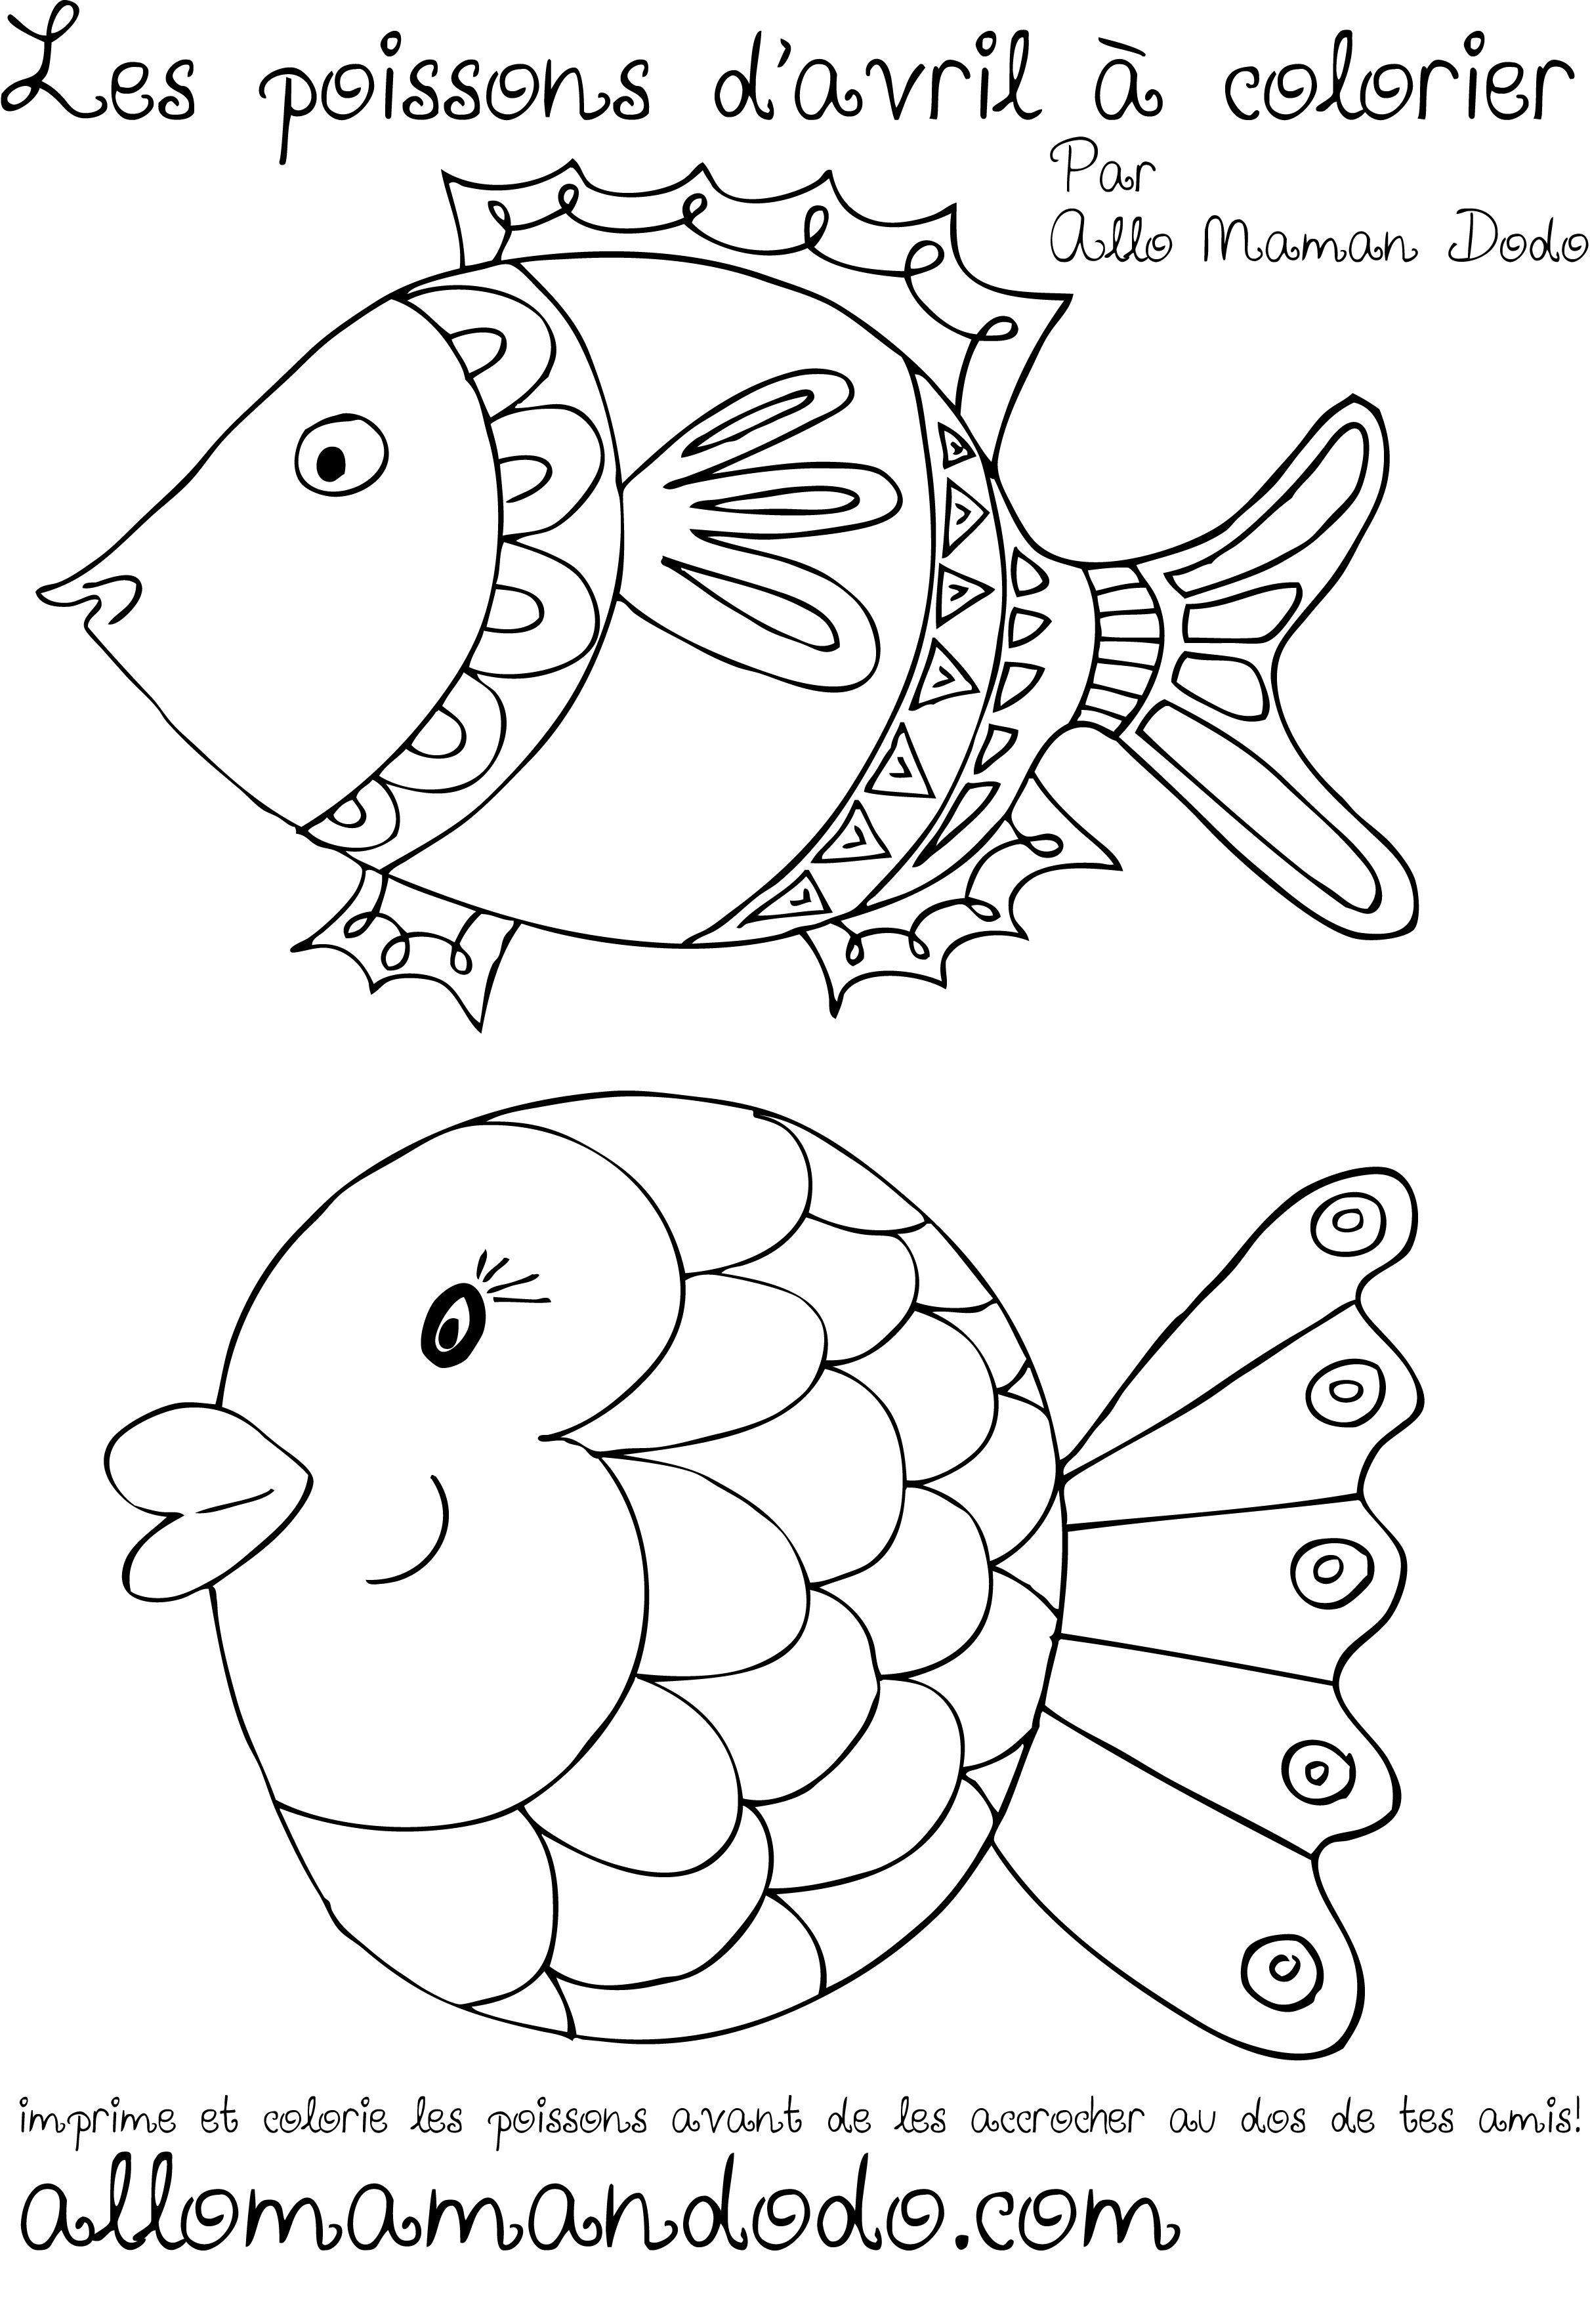 17 best images about poisson davril on pinterest bretagne mandalas and april fools